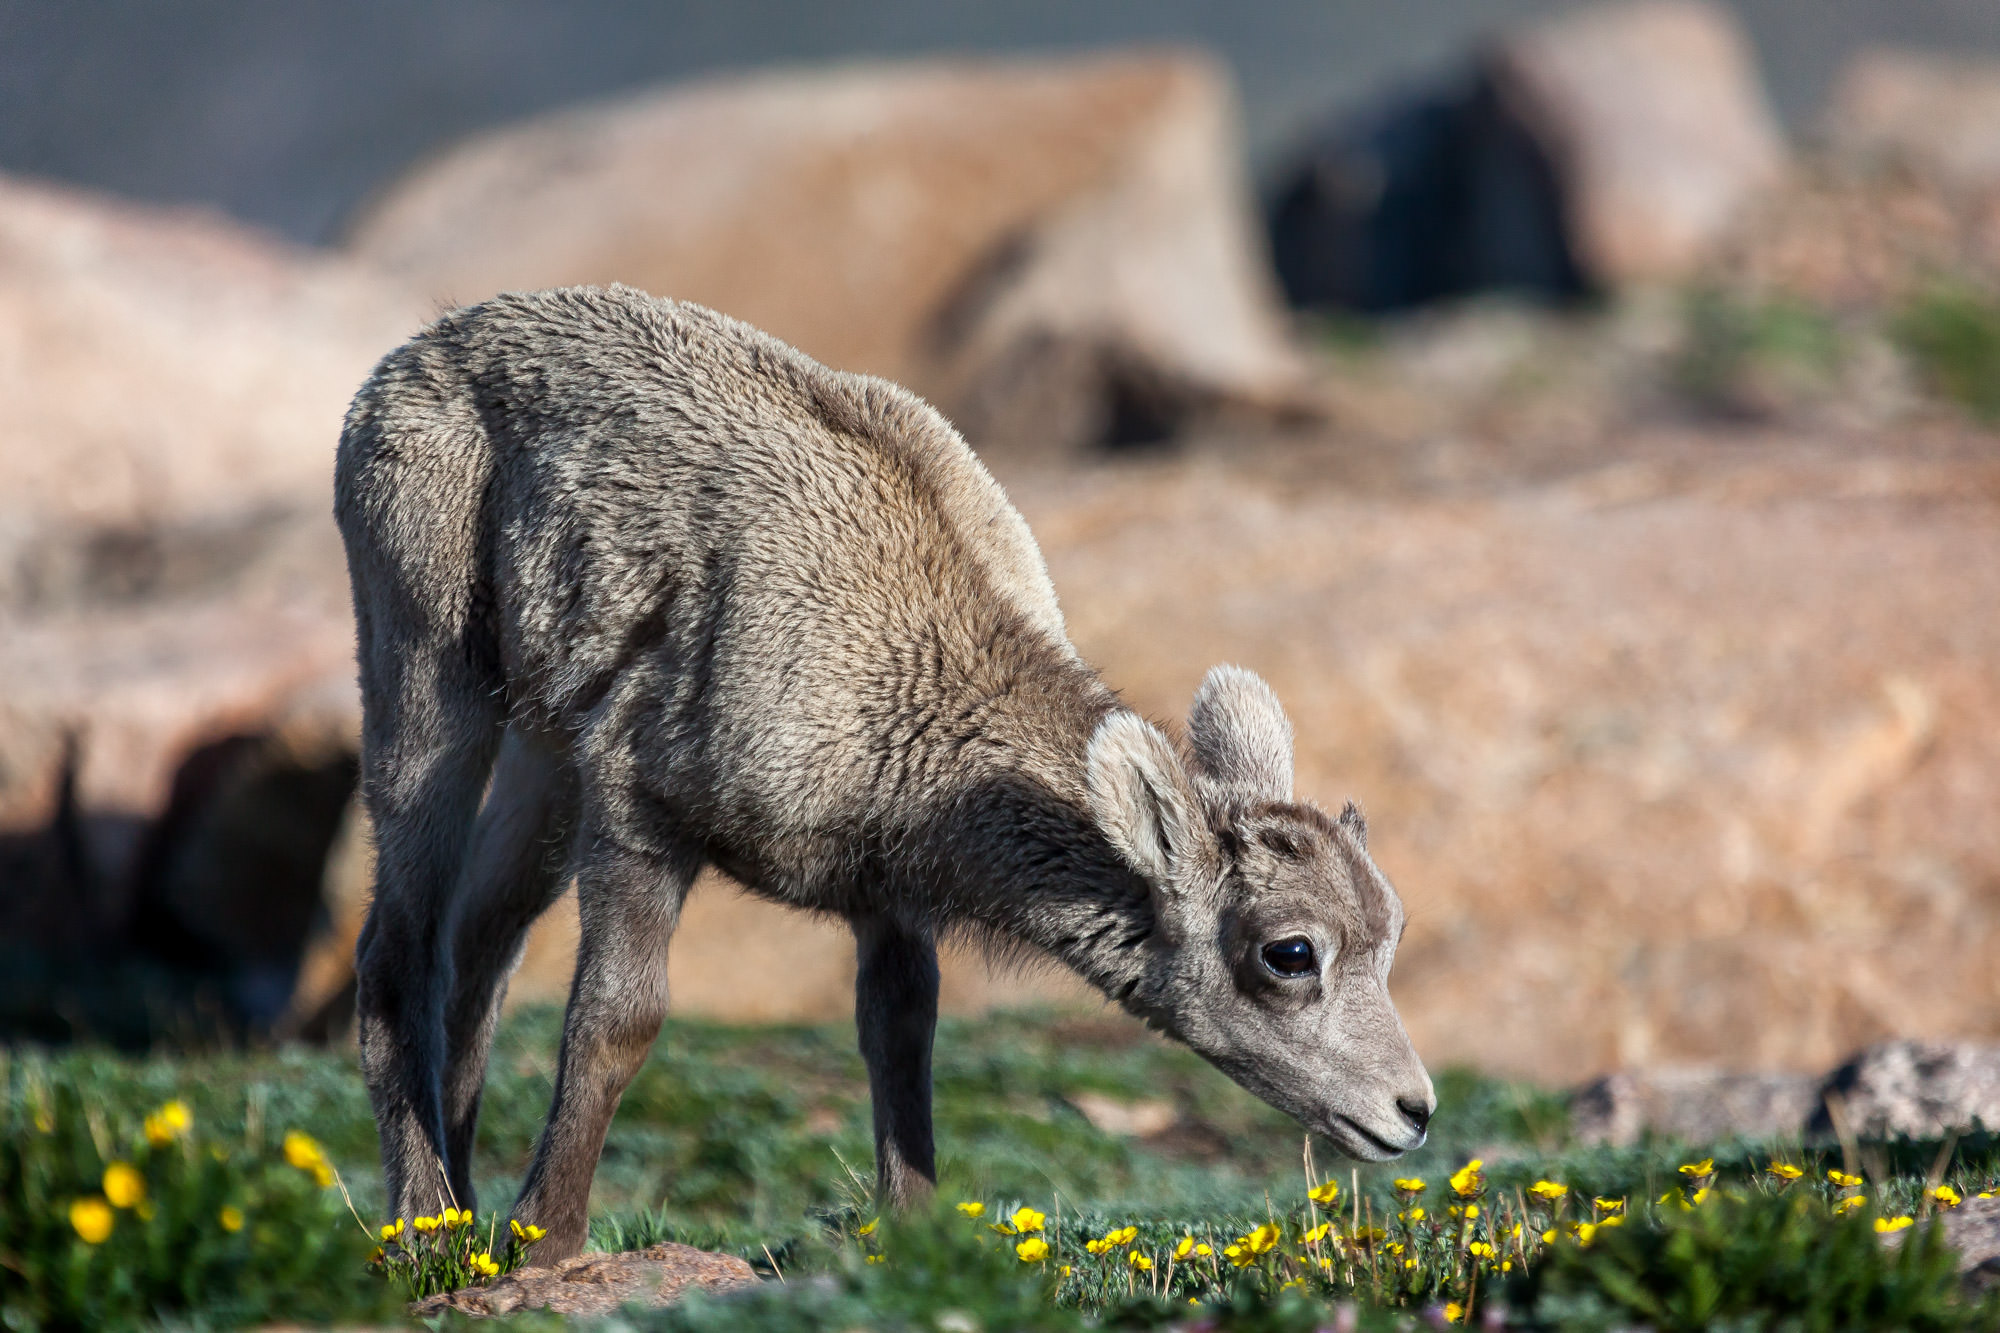 Bighorn, Sheep, Ram, Colorado, limited edition, photograph, fine art, wildlife, photo